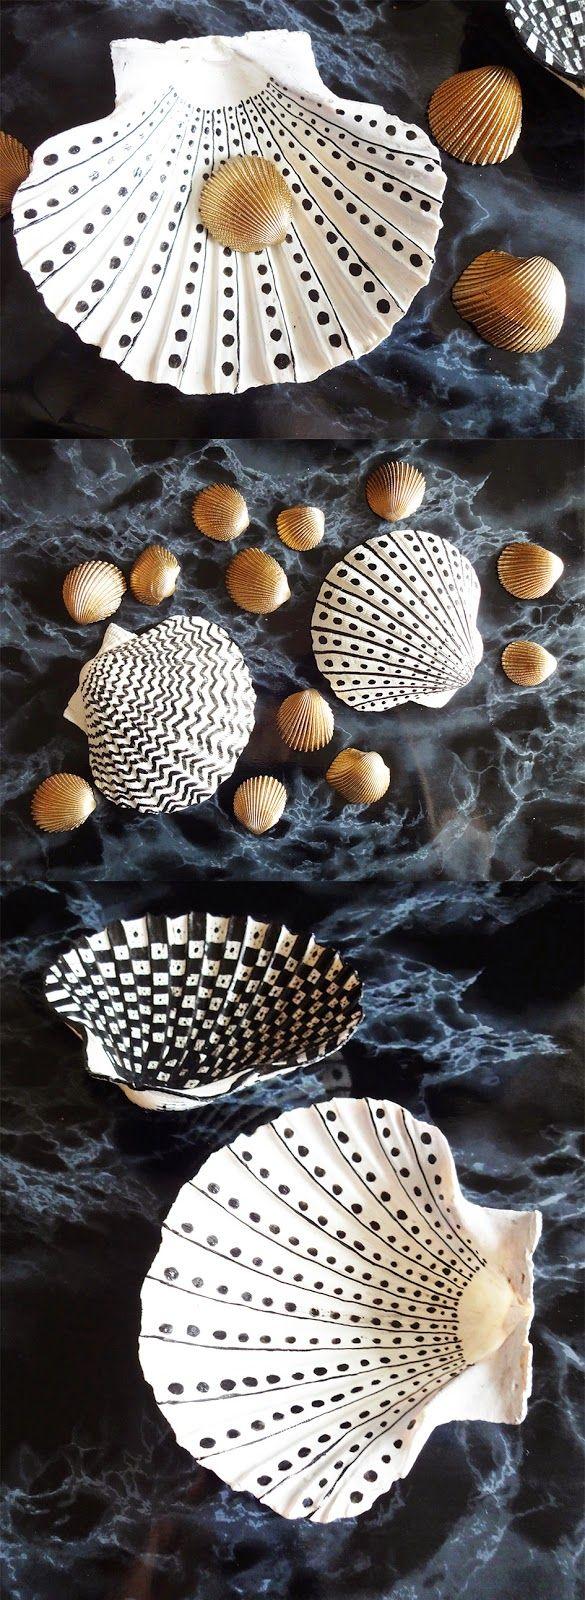 basteln malen kuchen backen: Seifenschalen aus Muscheln